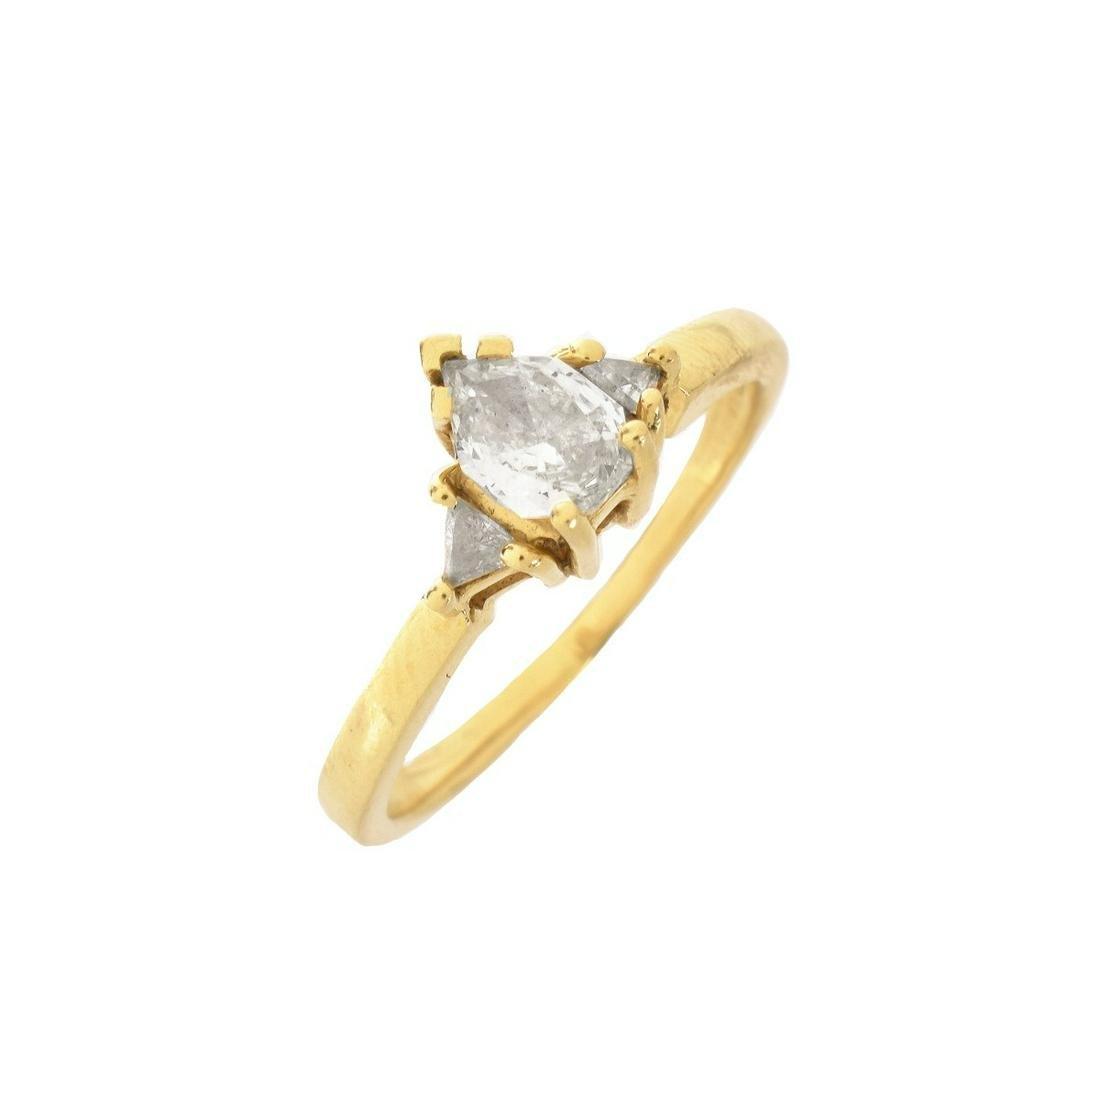 Vintage Diamond and 14K Ring